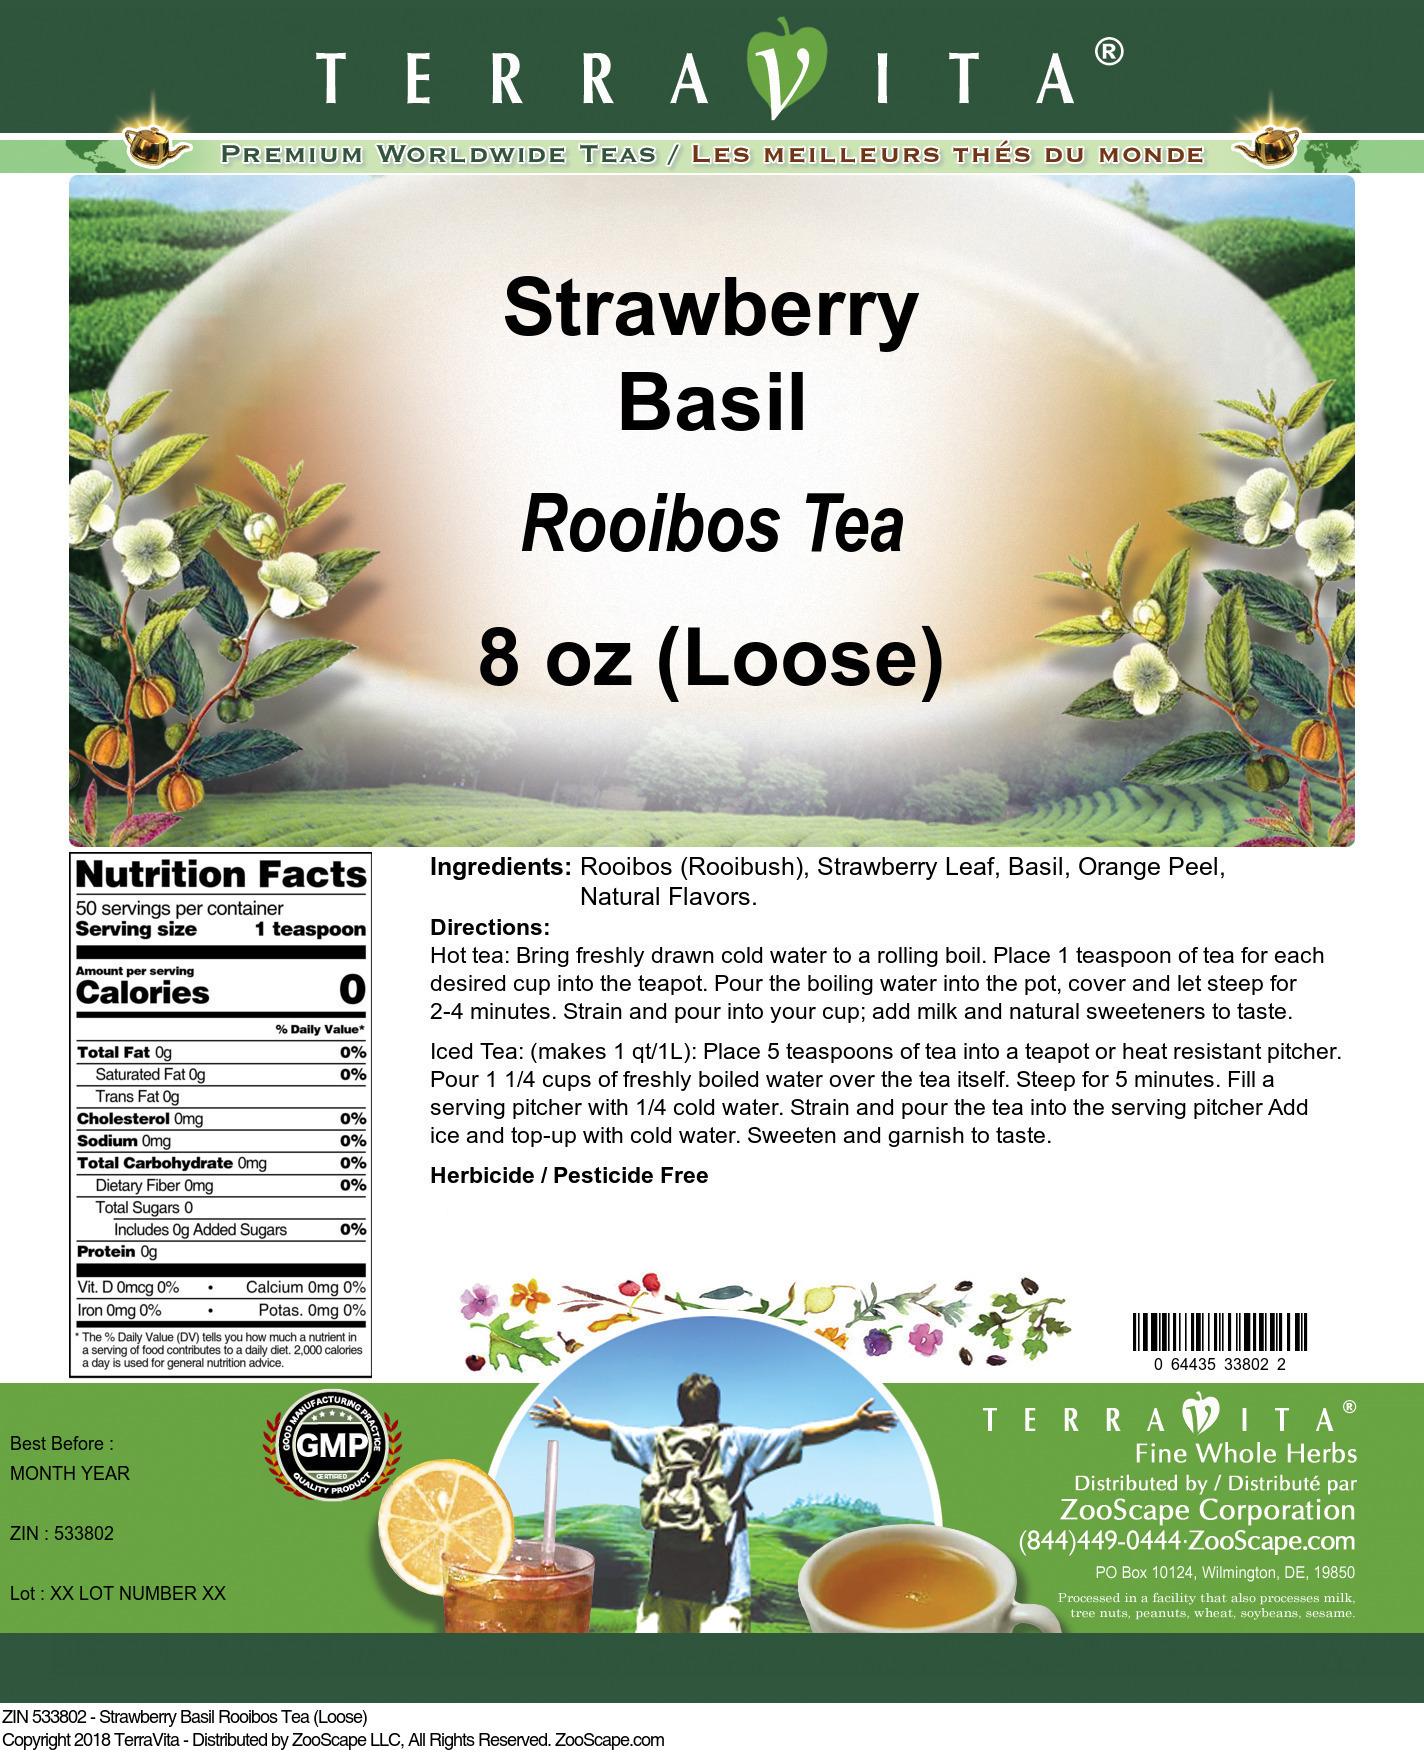 Strawberry Basil Rooibos Tea (Loose)